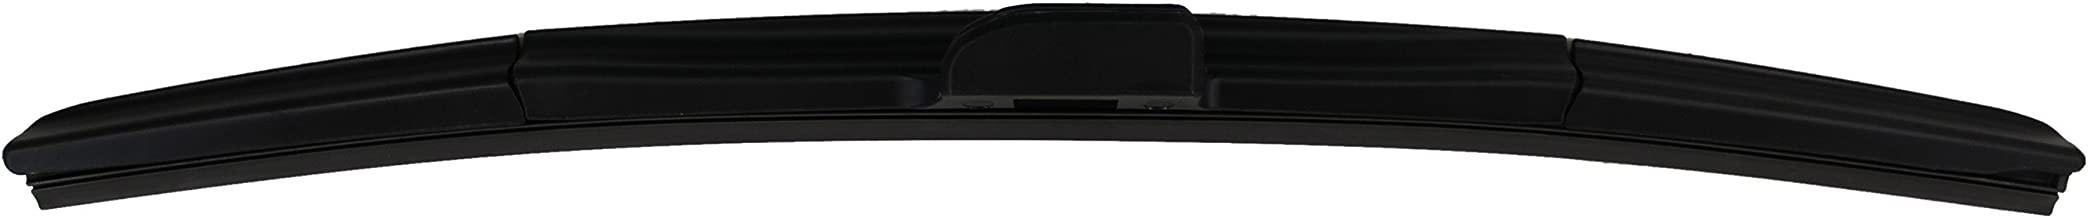 Honda 76630-SWA-A02 Automotive Accessories